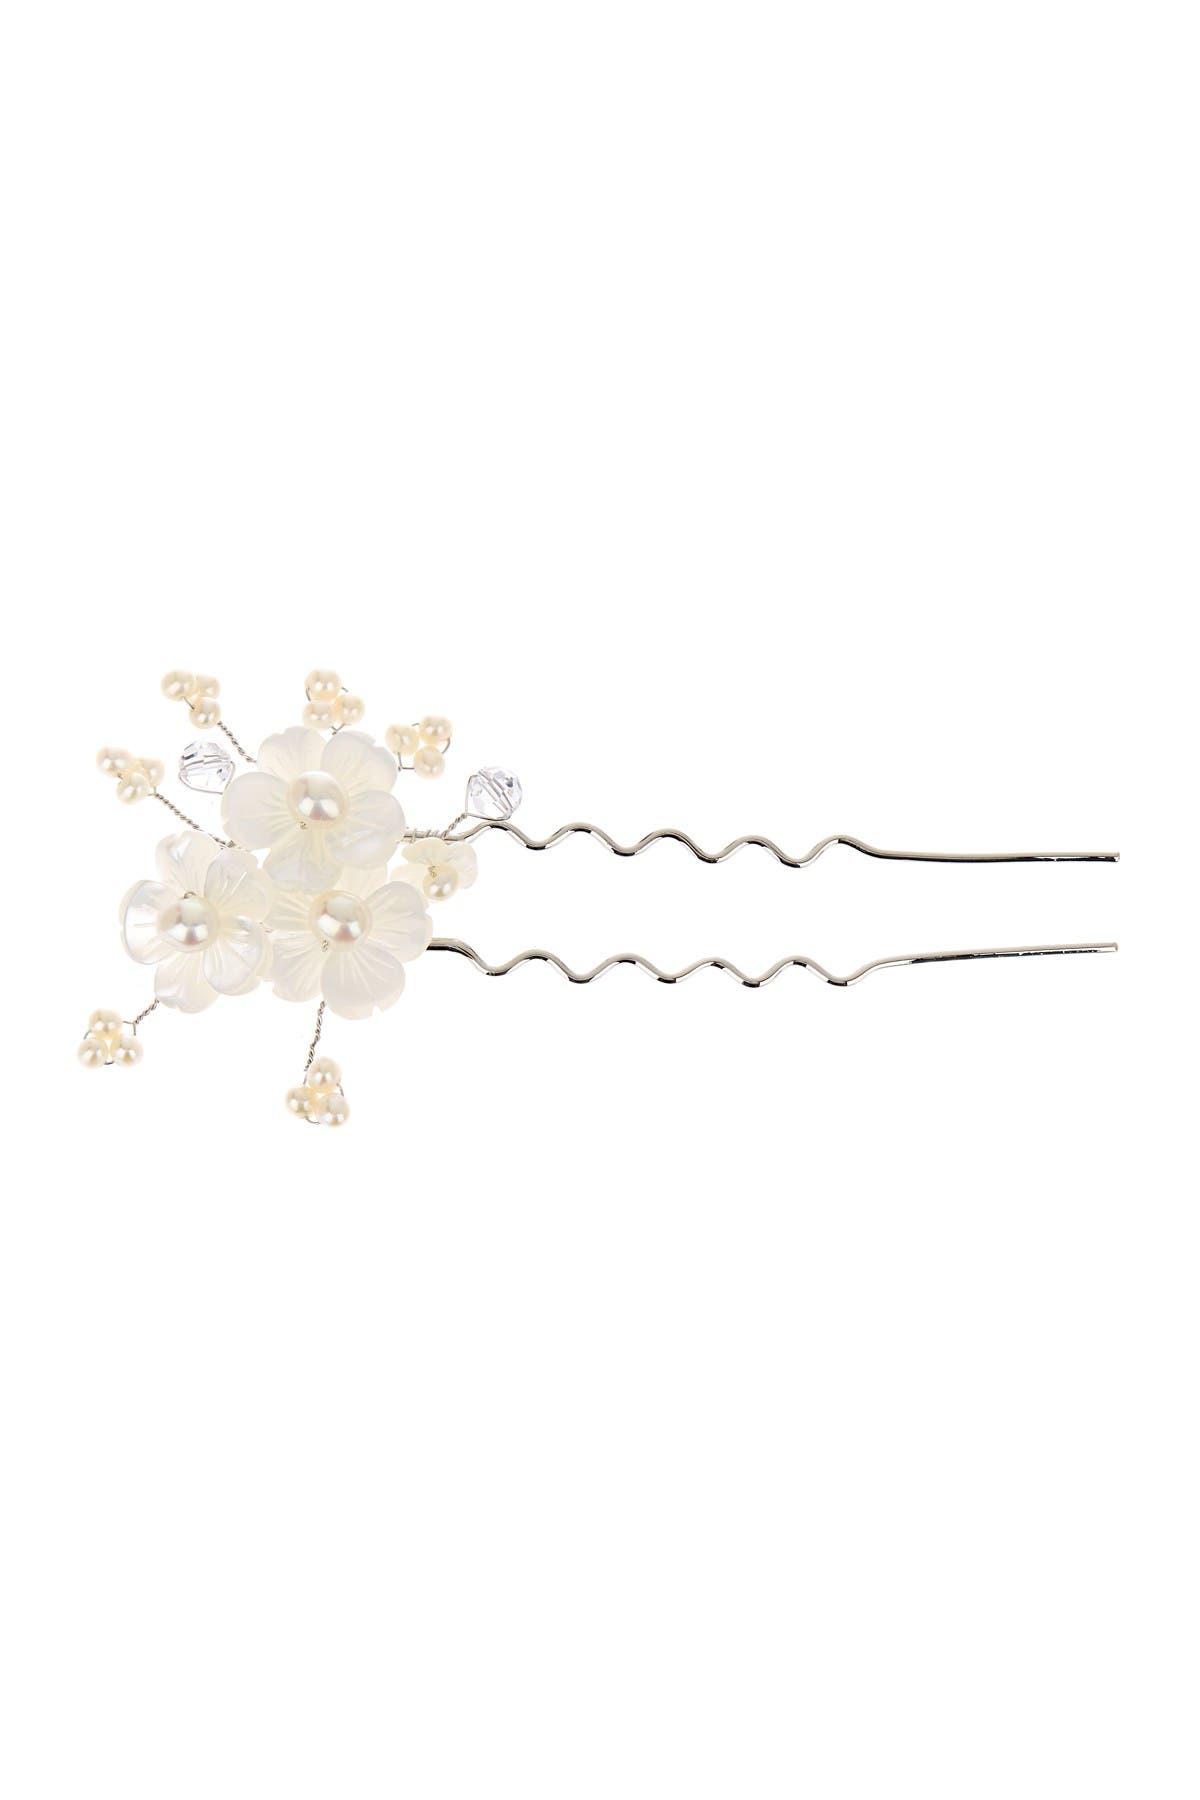 Image of Splendid Pearls Floral 7-8mm Freshwater Pearl Hair Pin